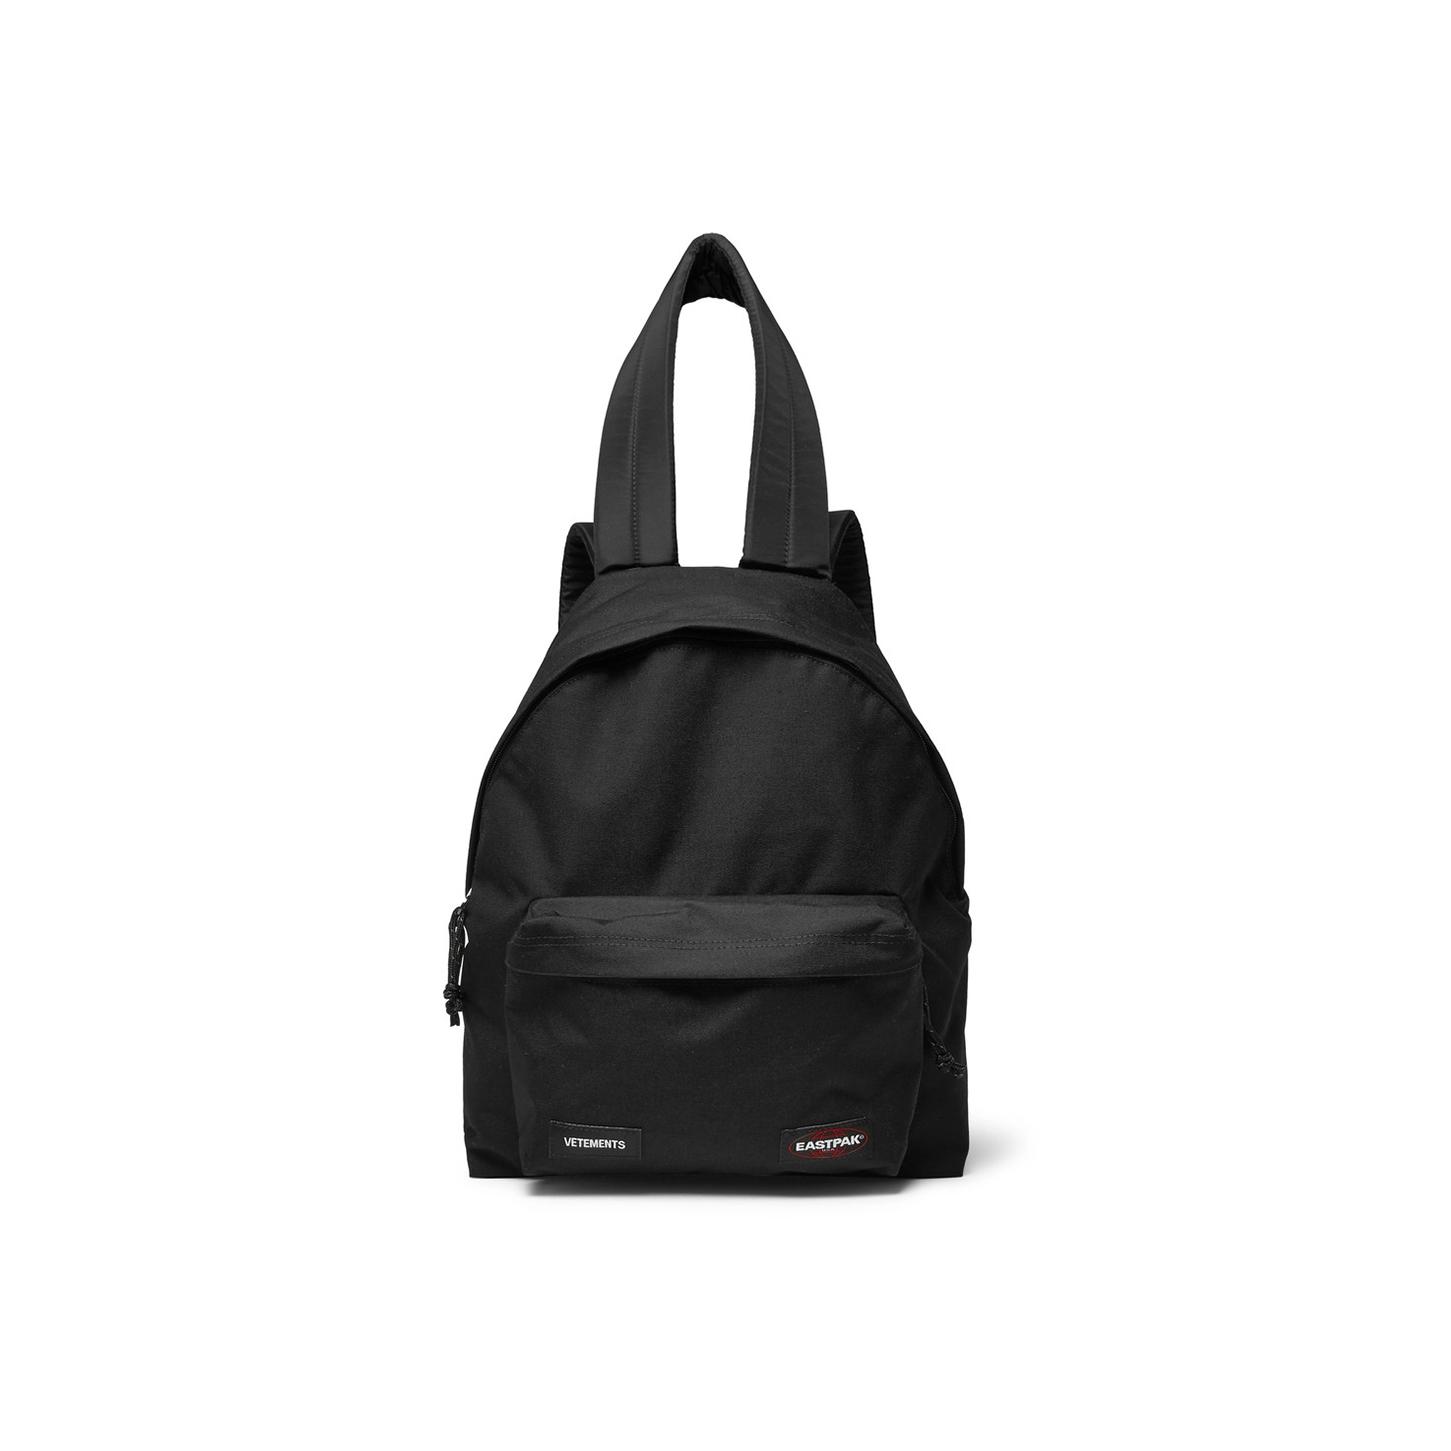 vetements x eastpak backpack-square